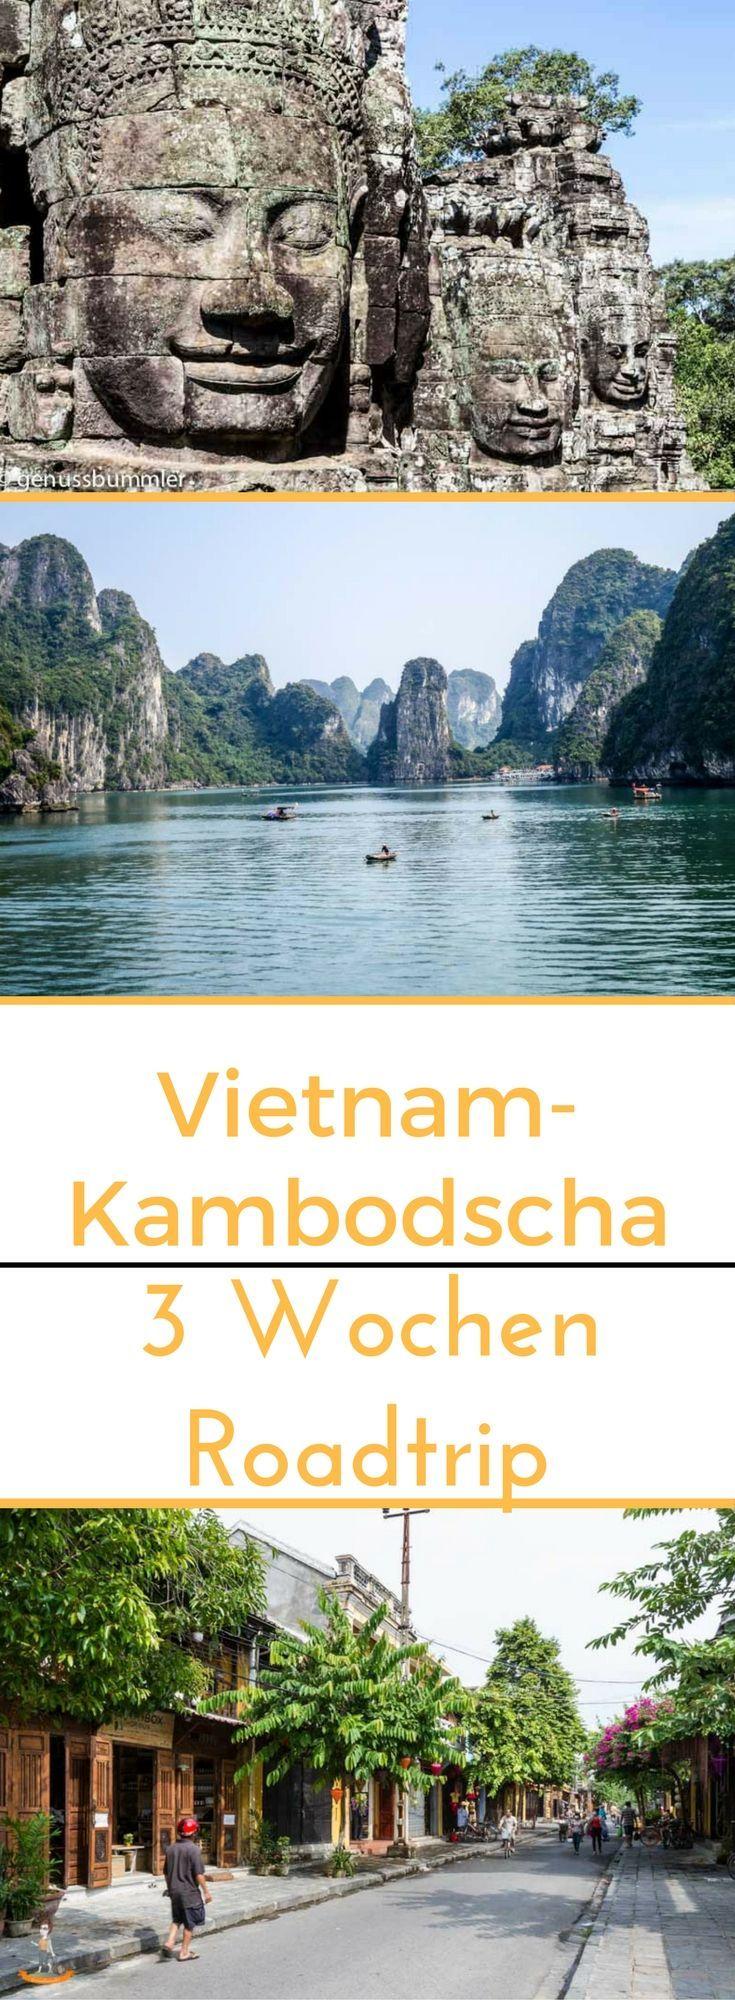 Roadtrip 6: Vietnam-Kambodscha